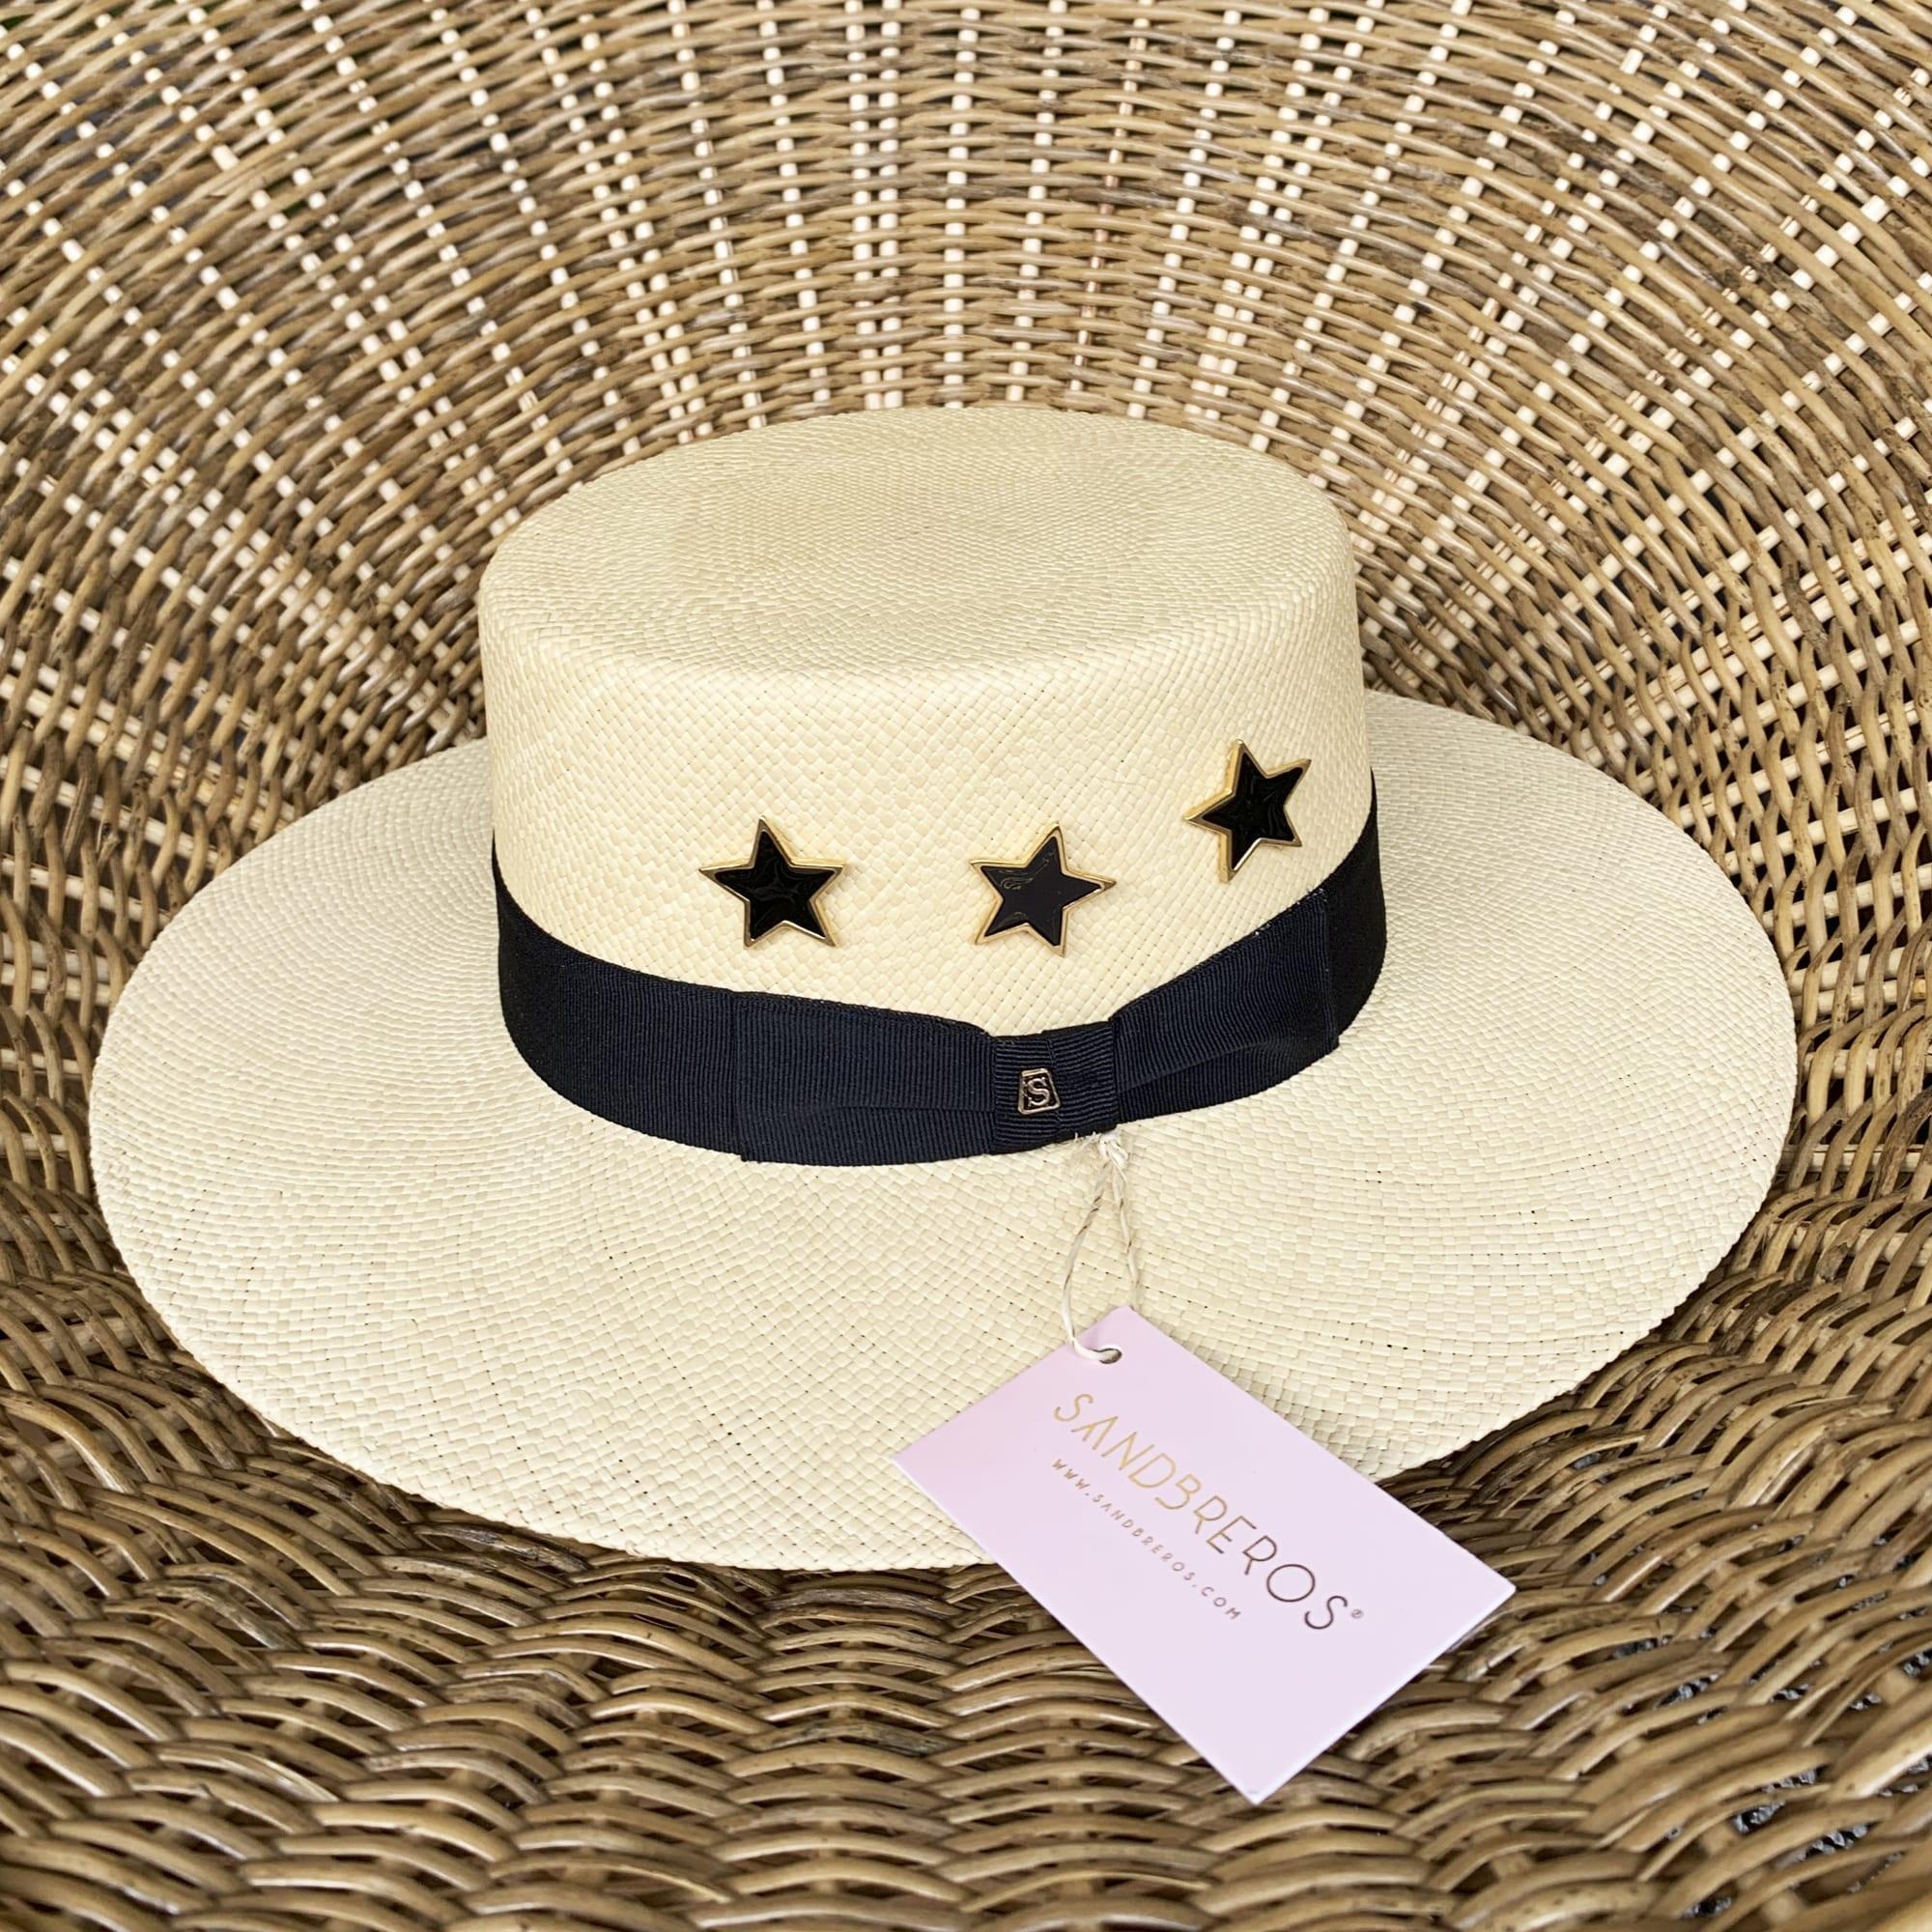 Sombrero Cordobés Black Star Sombreros Sandbreros